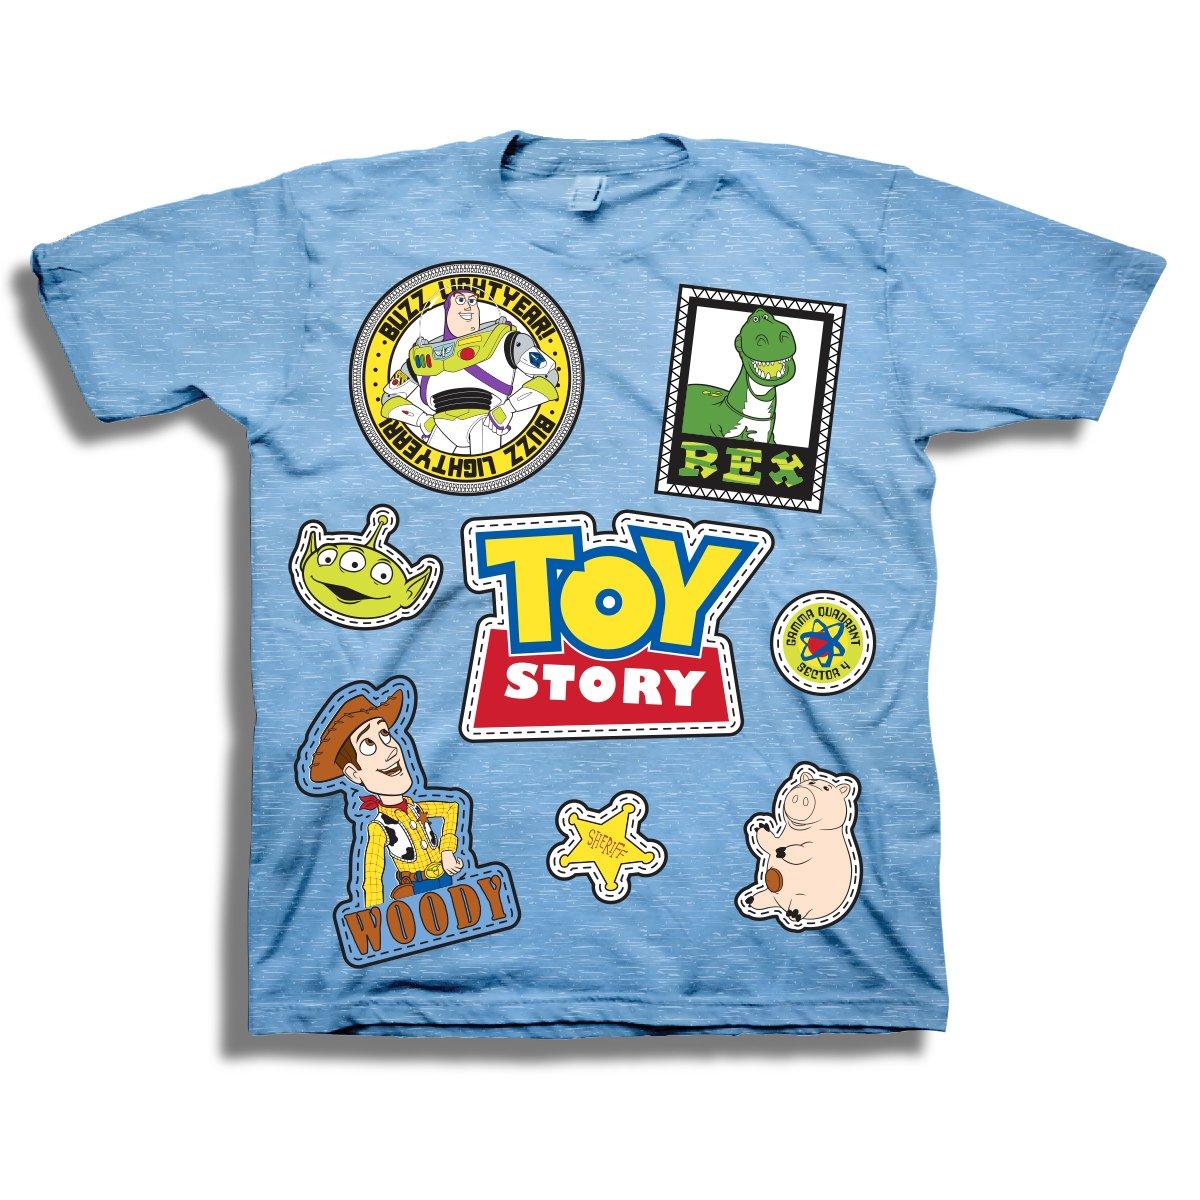 Disney Pixar Toy Story Shirt - Buzz Lightyear and Sheriff Woody Tee - Toy Story T-Shirt (4T)